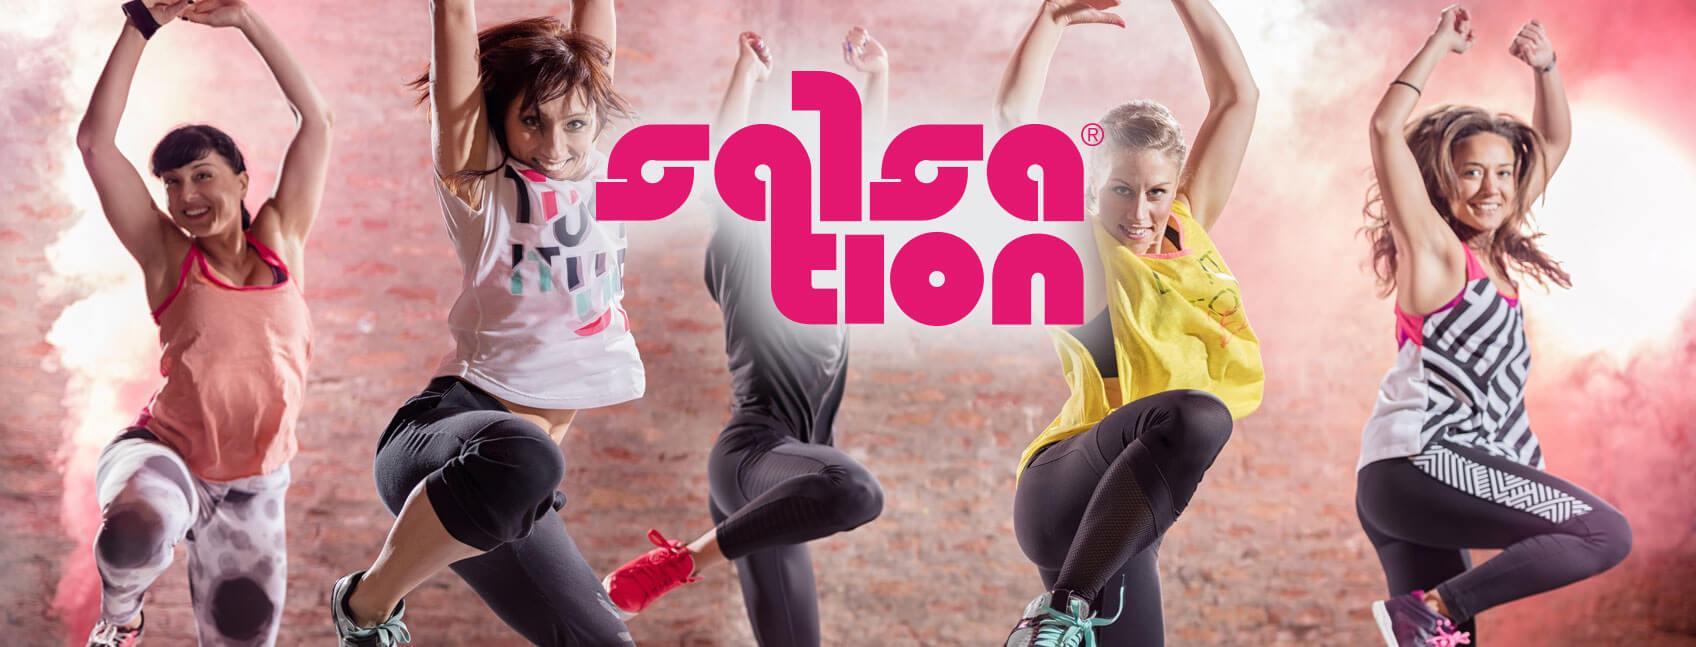 Salsation™ Fitness